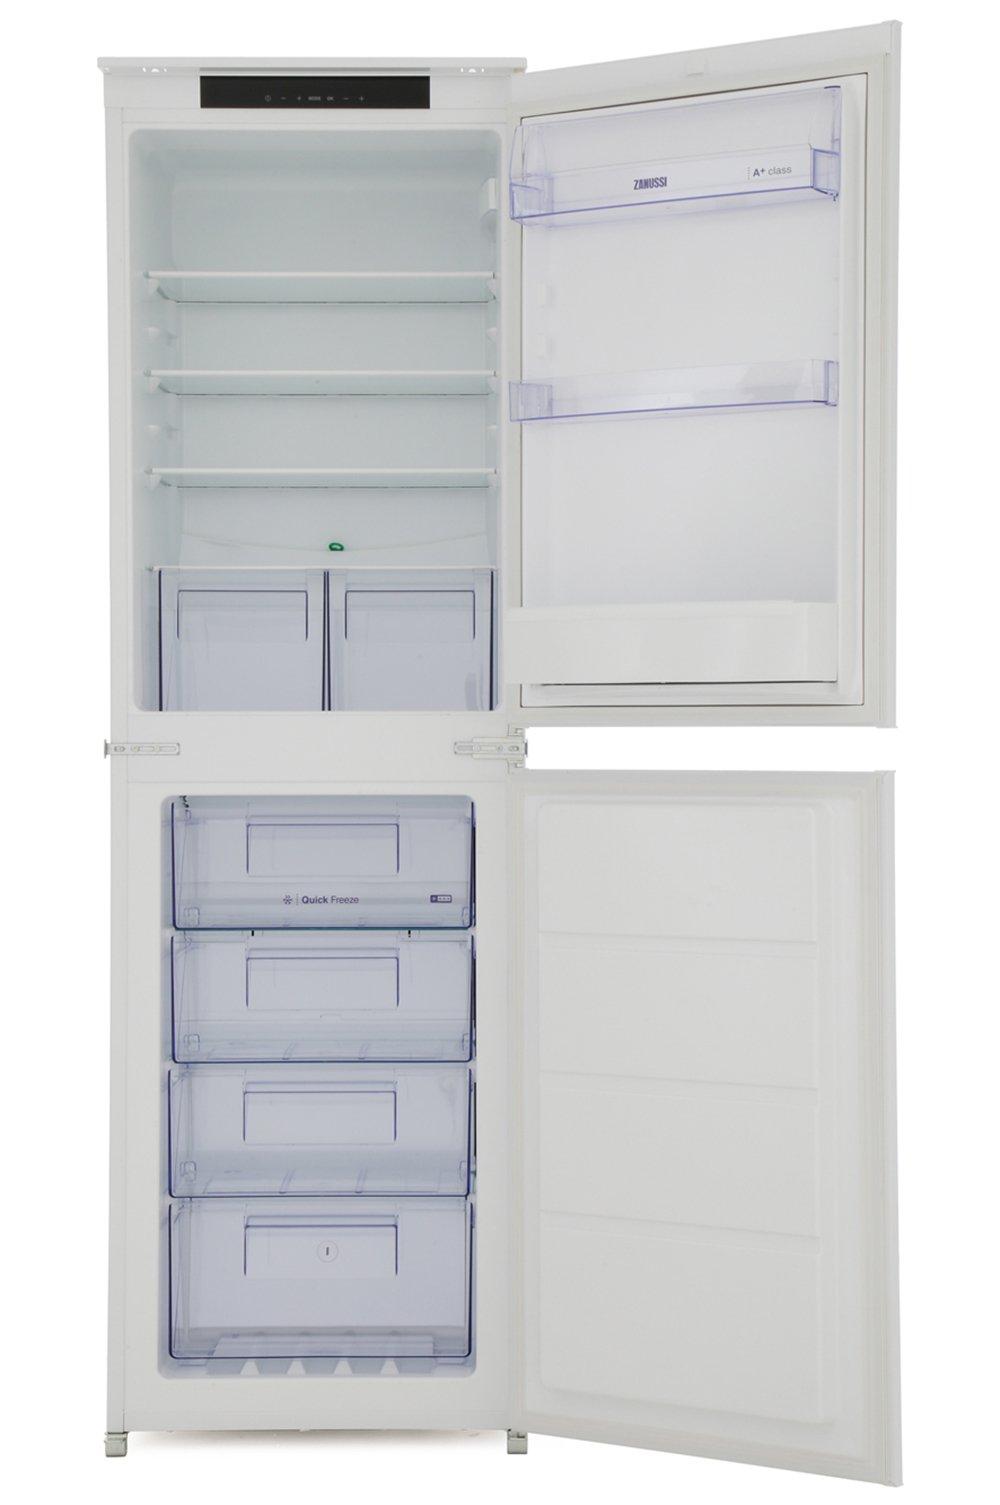 Zanussi ZBB27650SV Frost Free Integrated Fridge Freezer